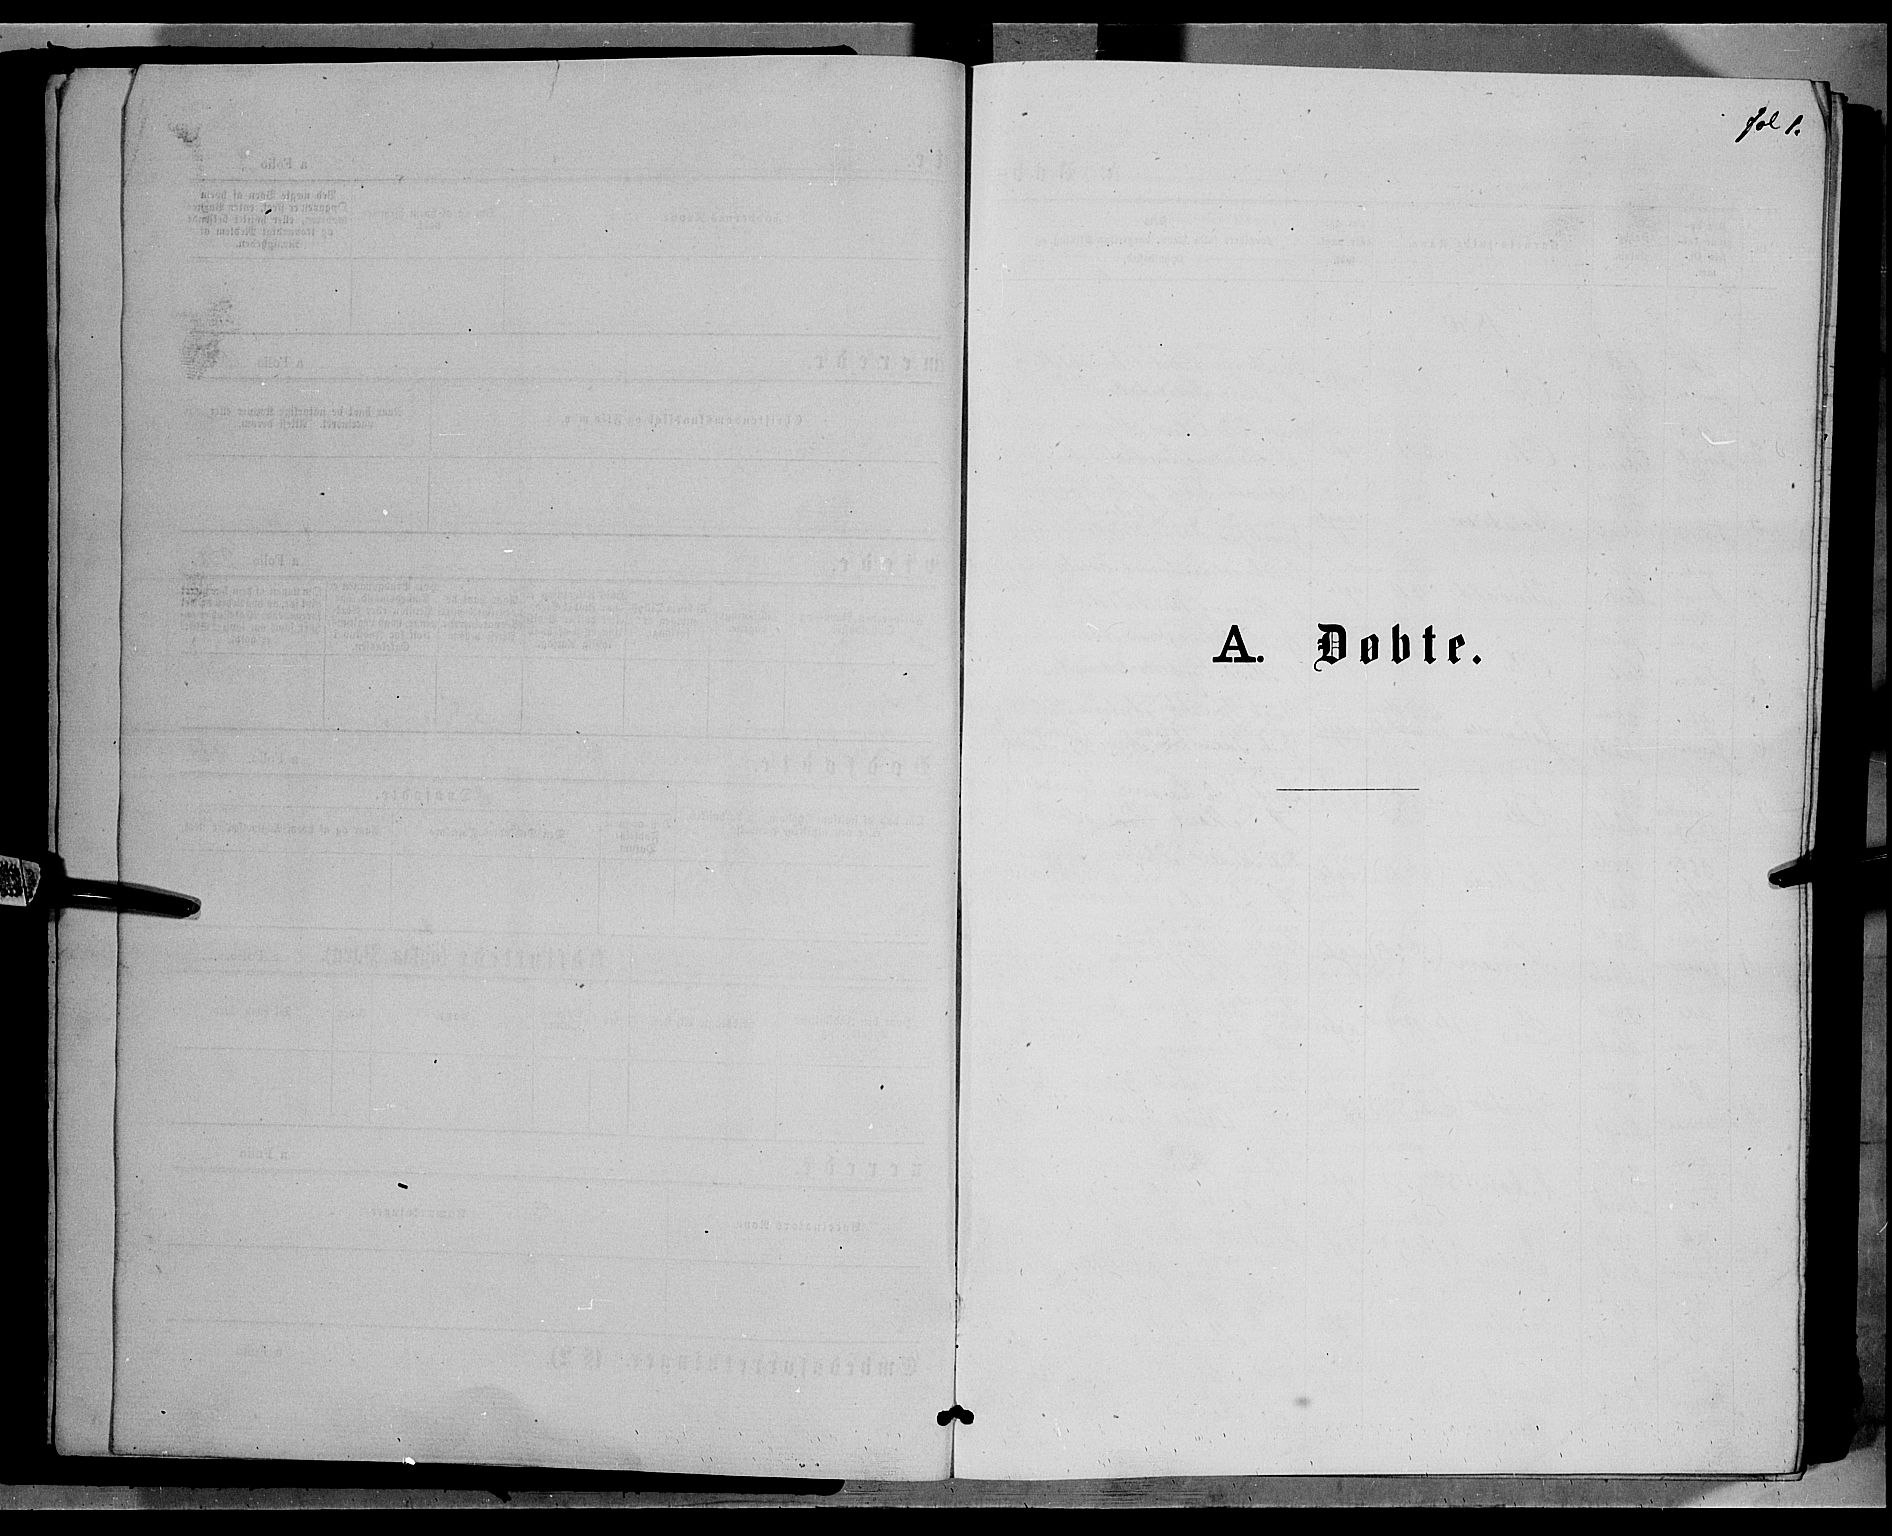 SAH, Ringebu prestekontor, Klokkerbok nr. 6, 1880-1898, s. 1